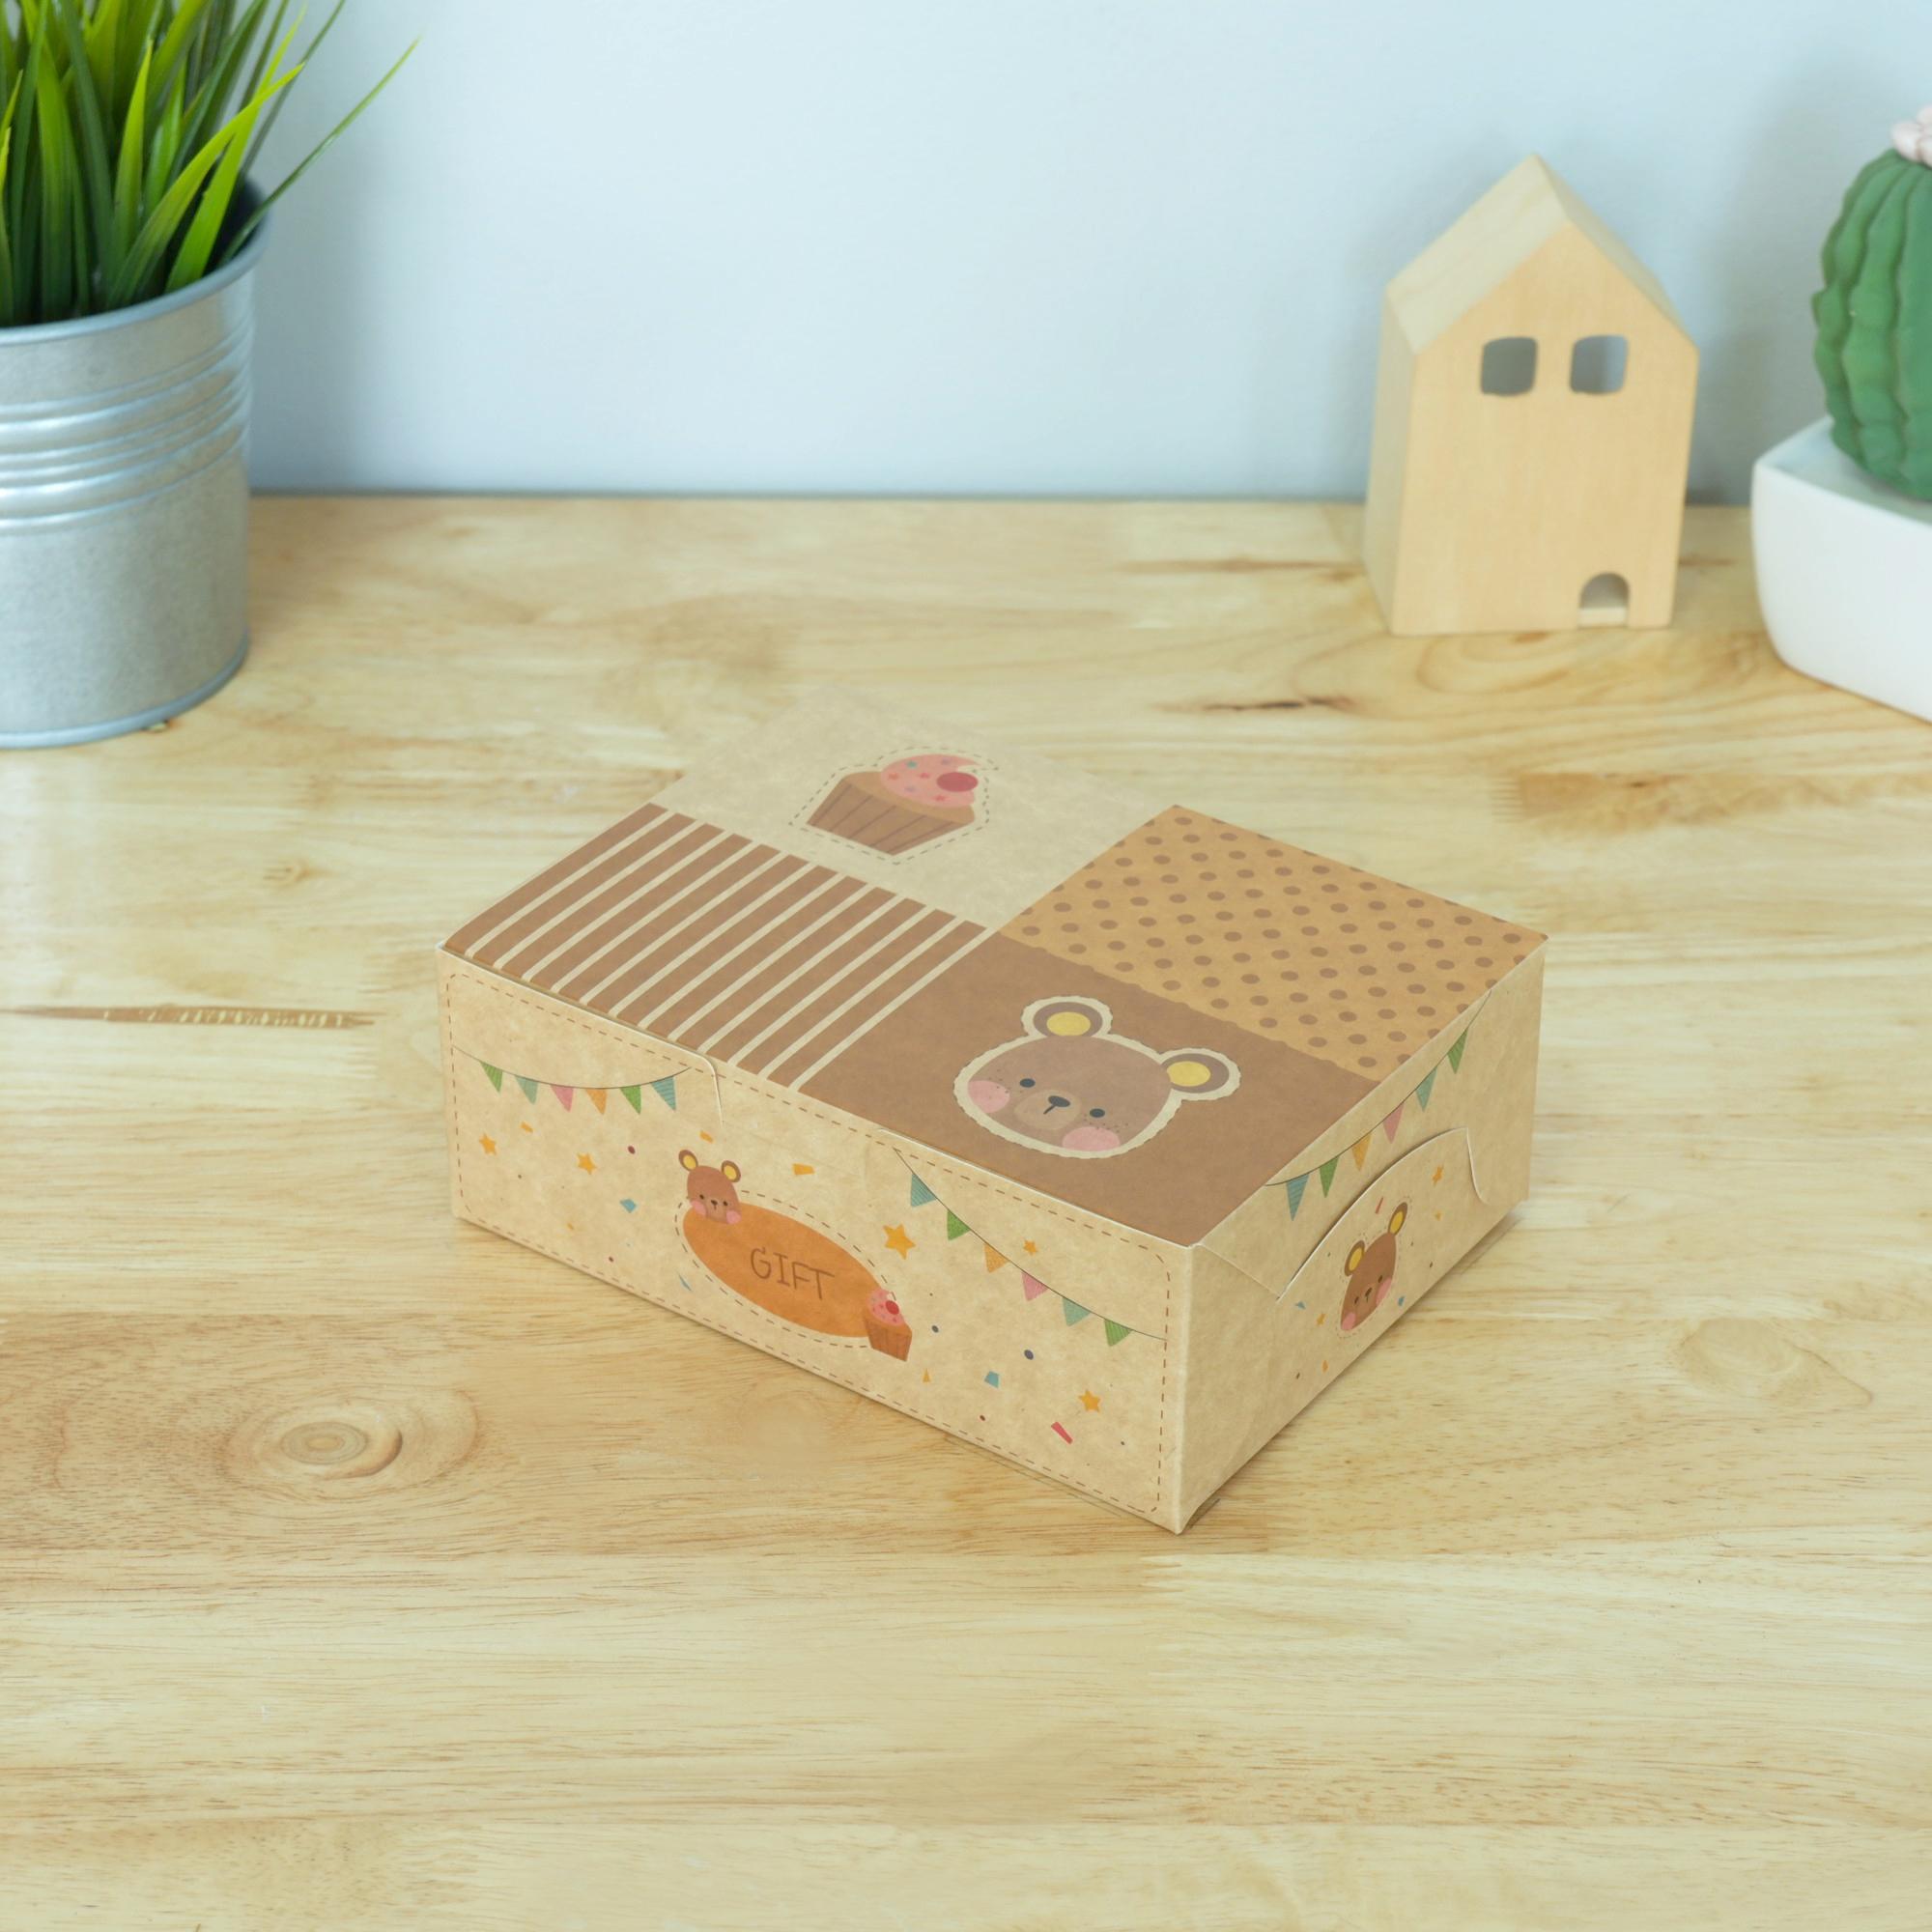 ECO Snack Box ทรงผืนผ้า ลายหมี คัฟเค้ก